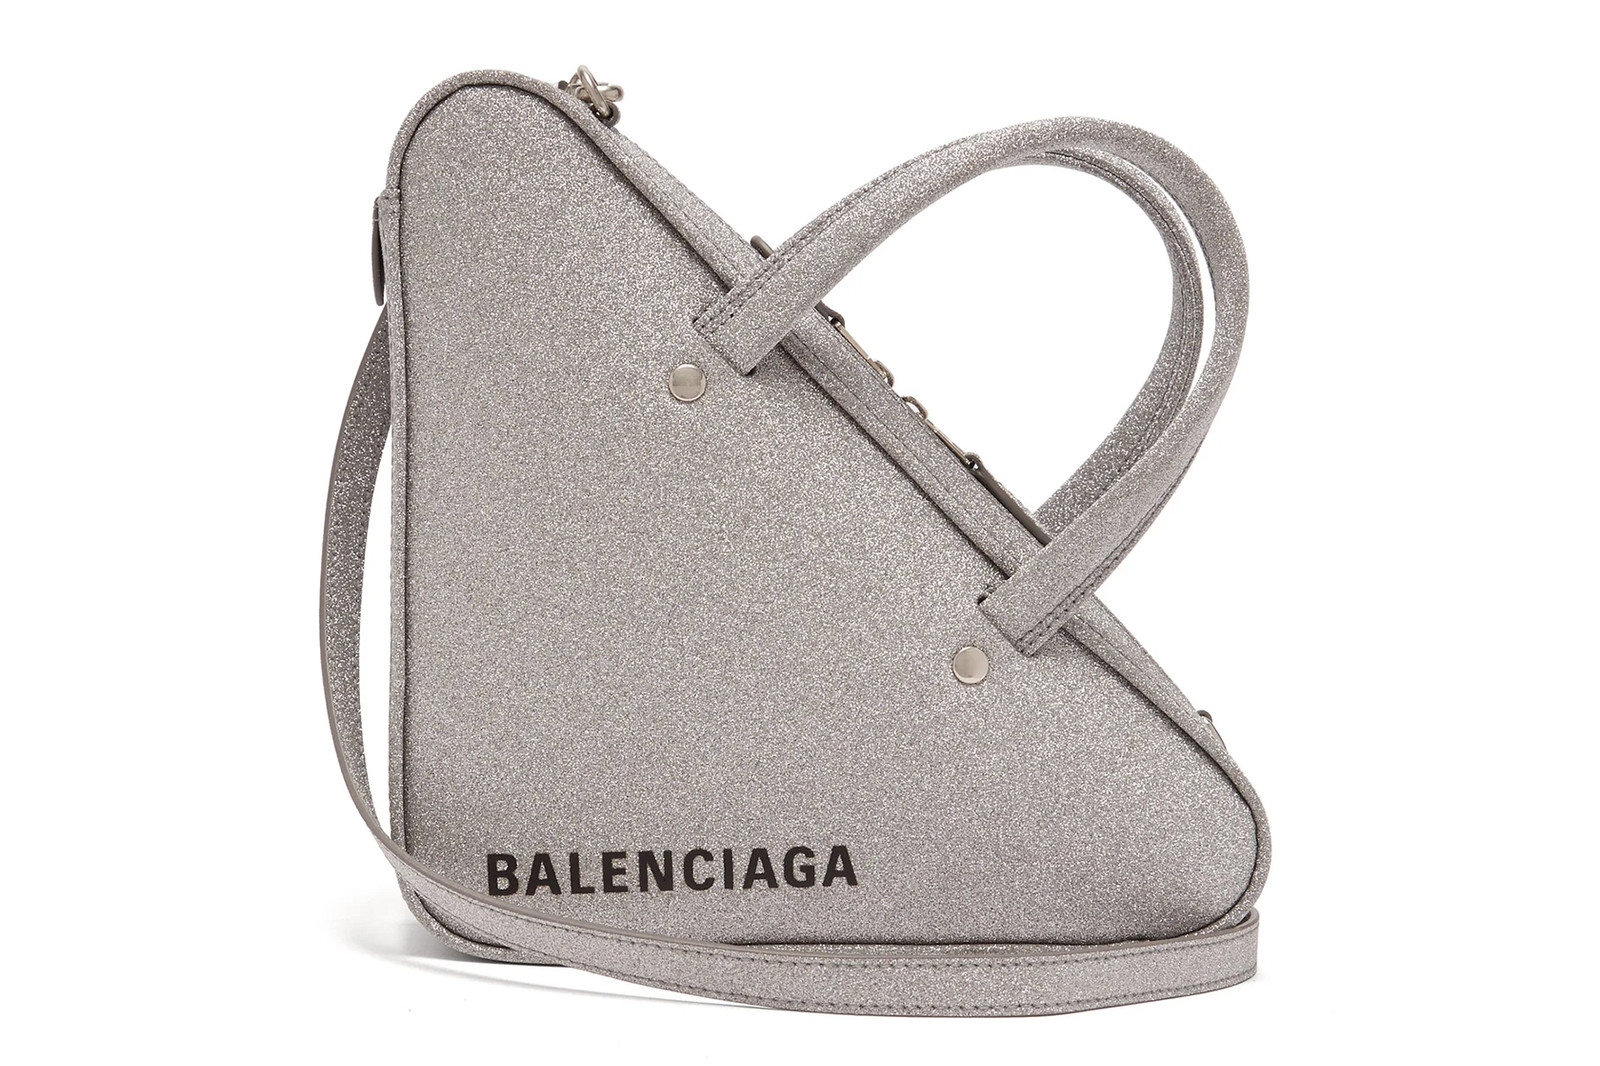 Designer Bags Silver Metallic Glitter Balenciaga Paco Rabanne Shrimps Alexander Wang Christian Louboutin